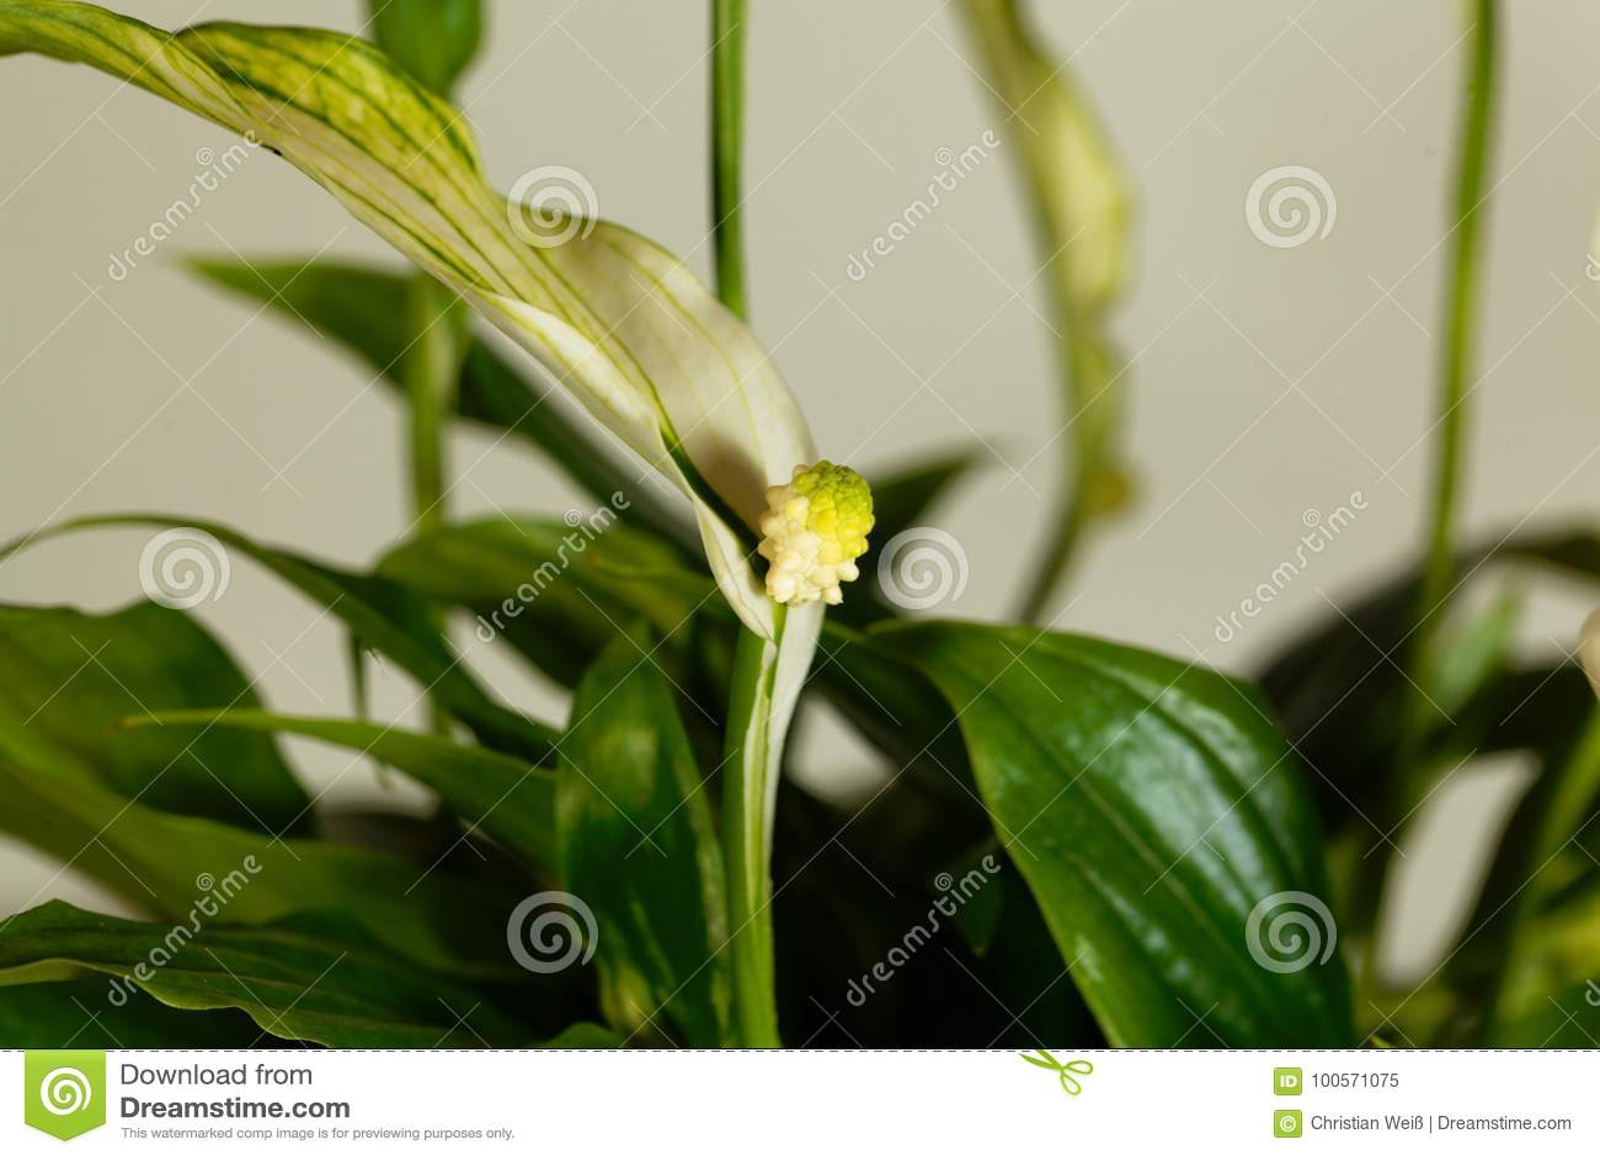 Peace lily flower spathiphyllum floribundum stock image image of peace lily flower spathiphyllum floribundum park nature izmirmasajfo